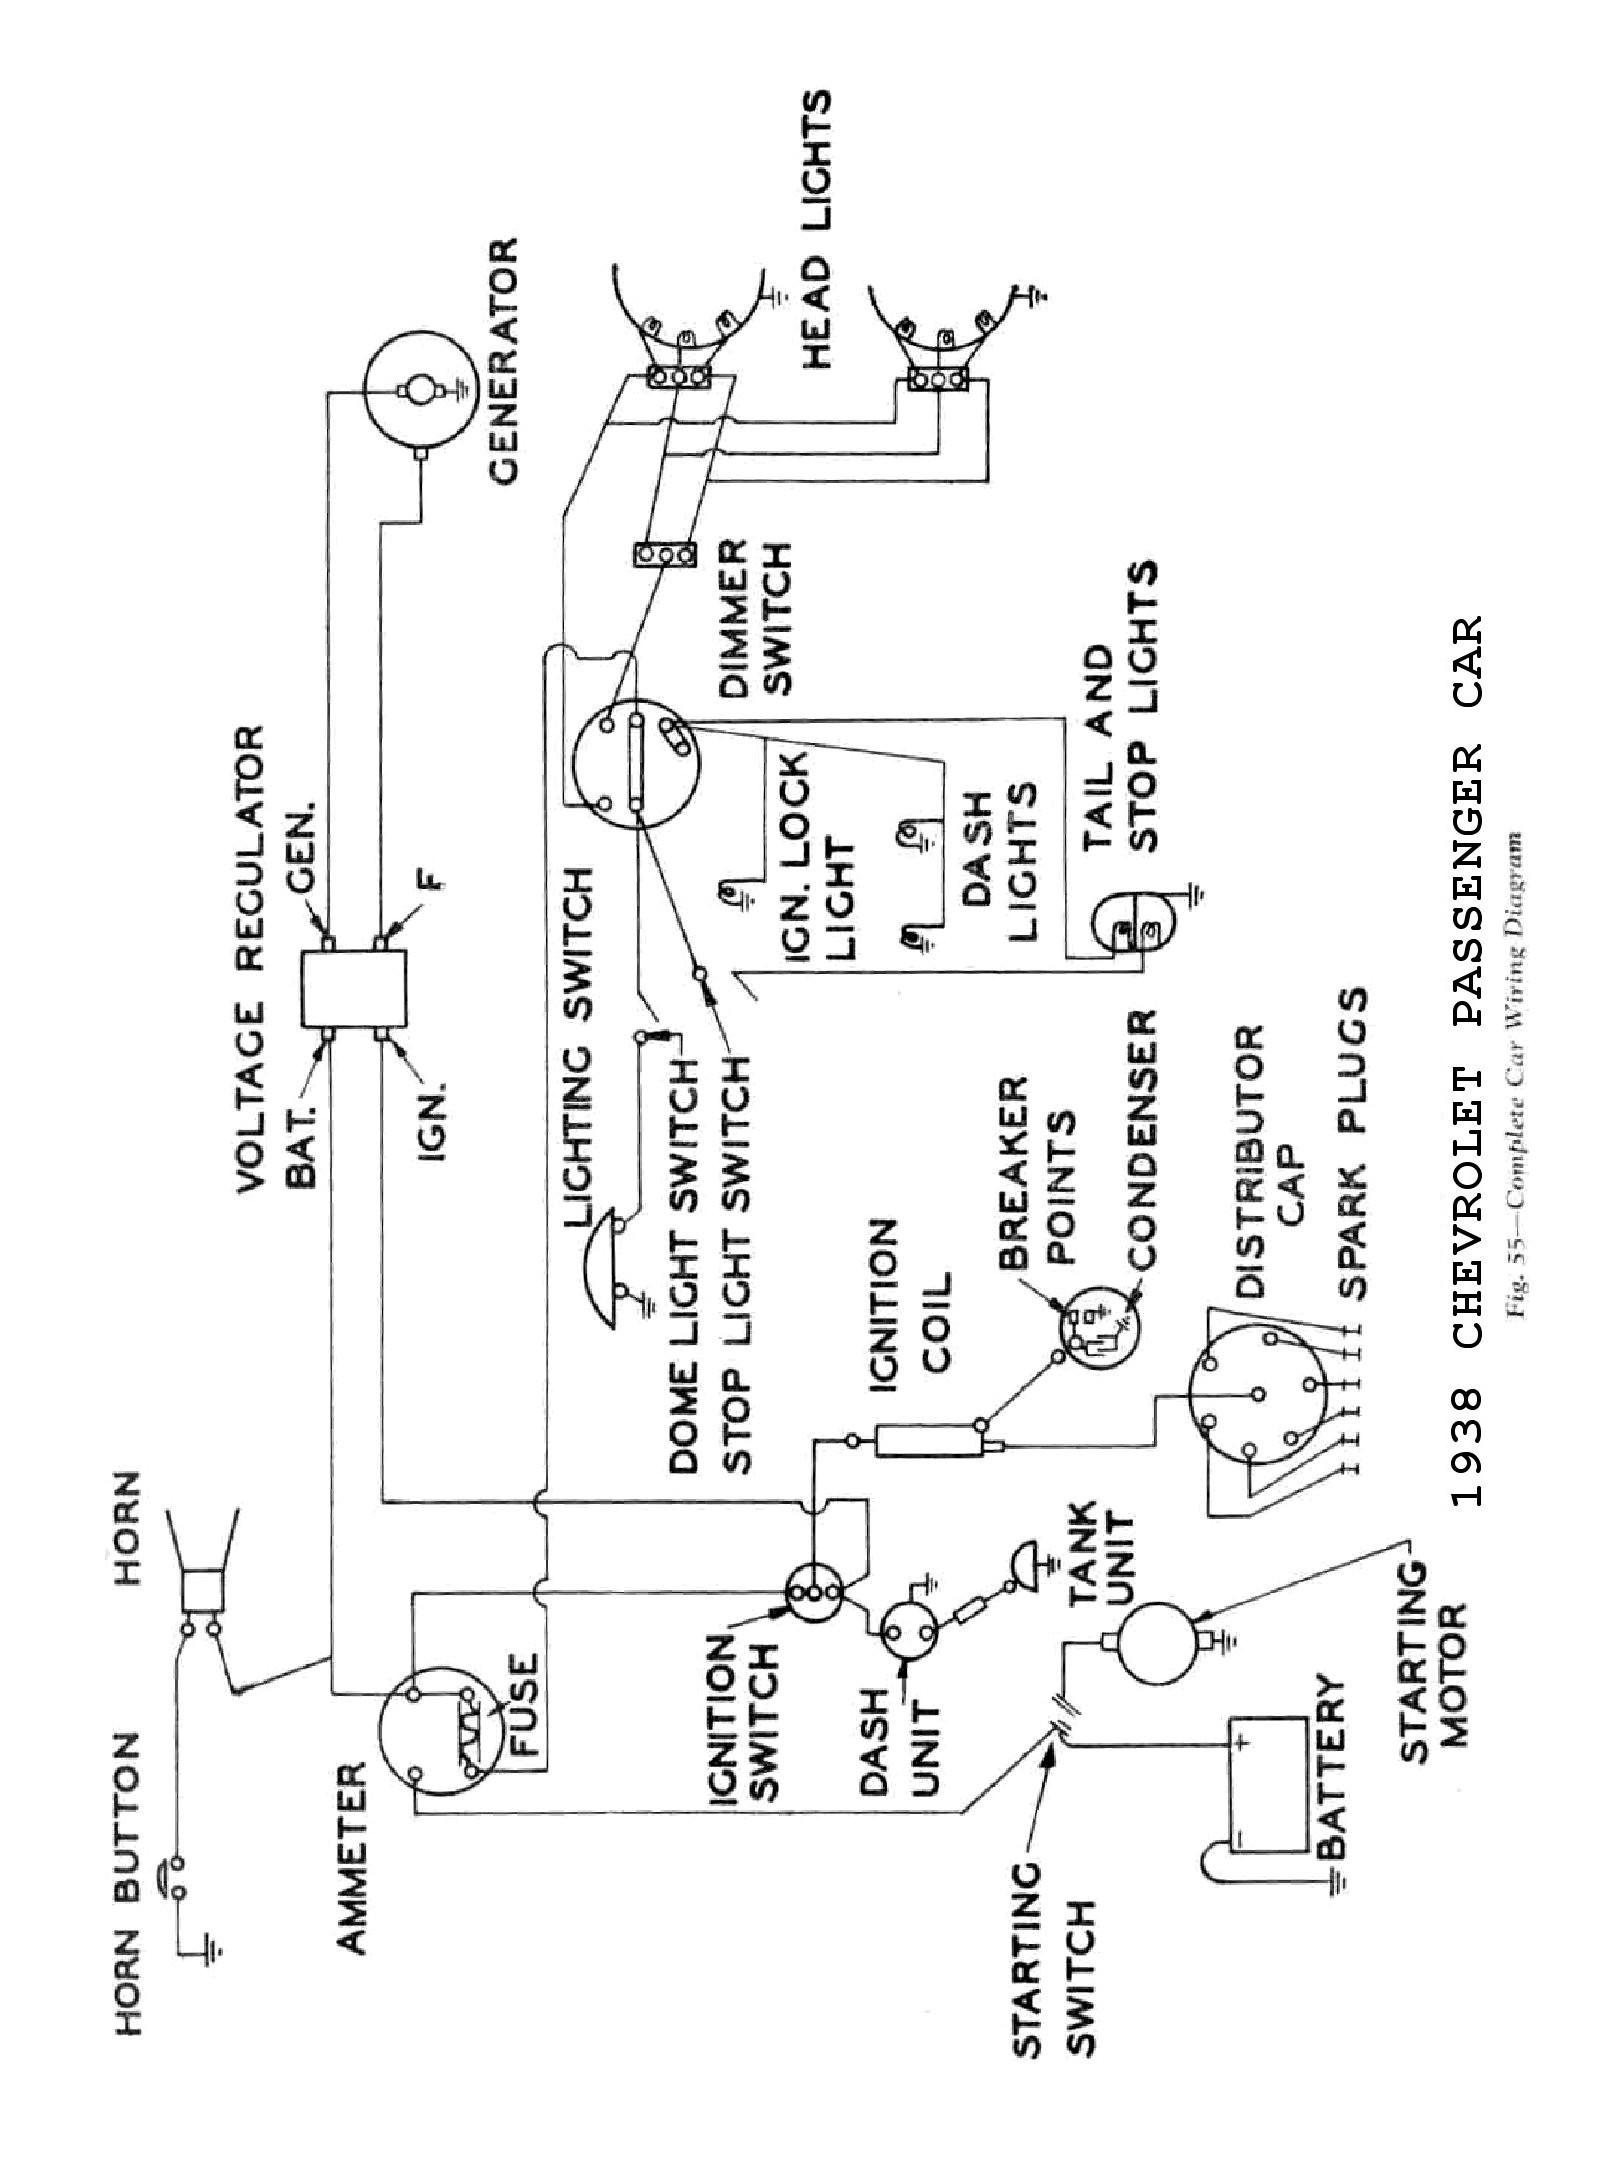 1999 Chevrolet Suburban Distributor Installation Diagram House Chevy Wiring Trusted Diagrams Rh Hamze Co 2000 2008